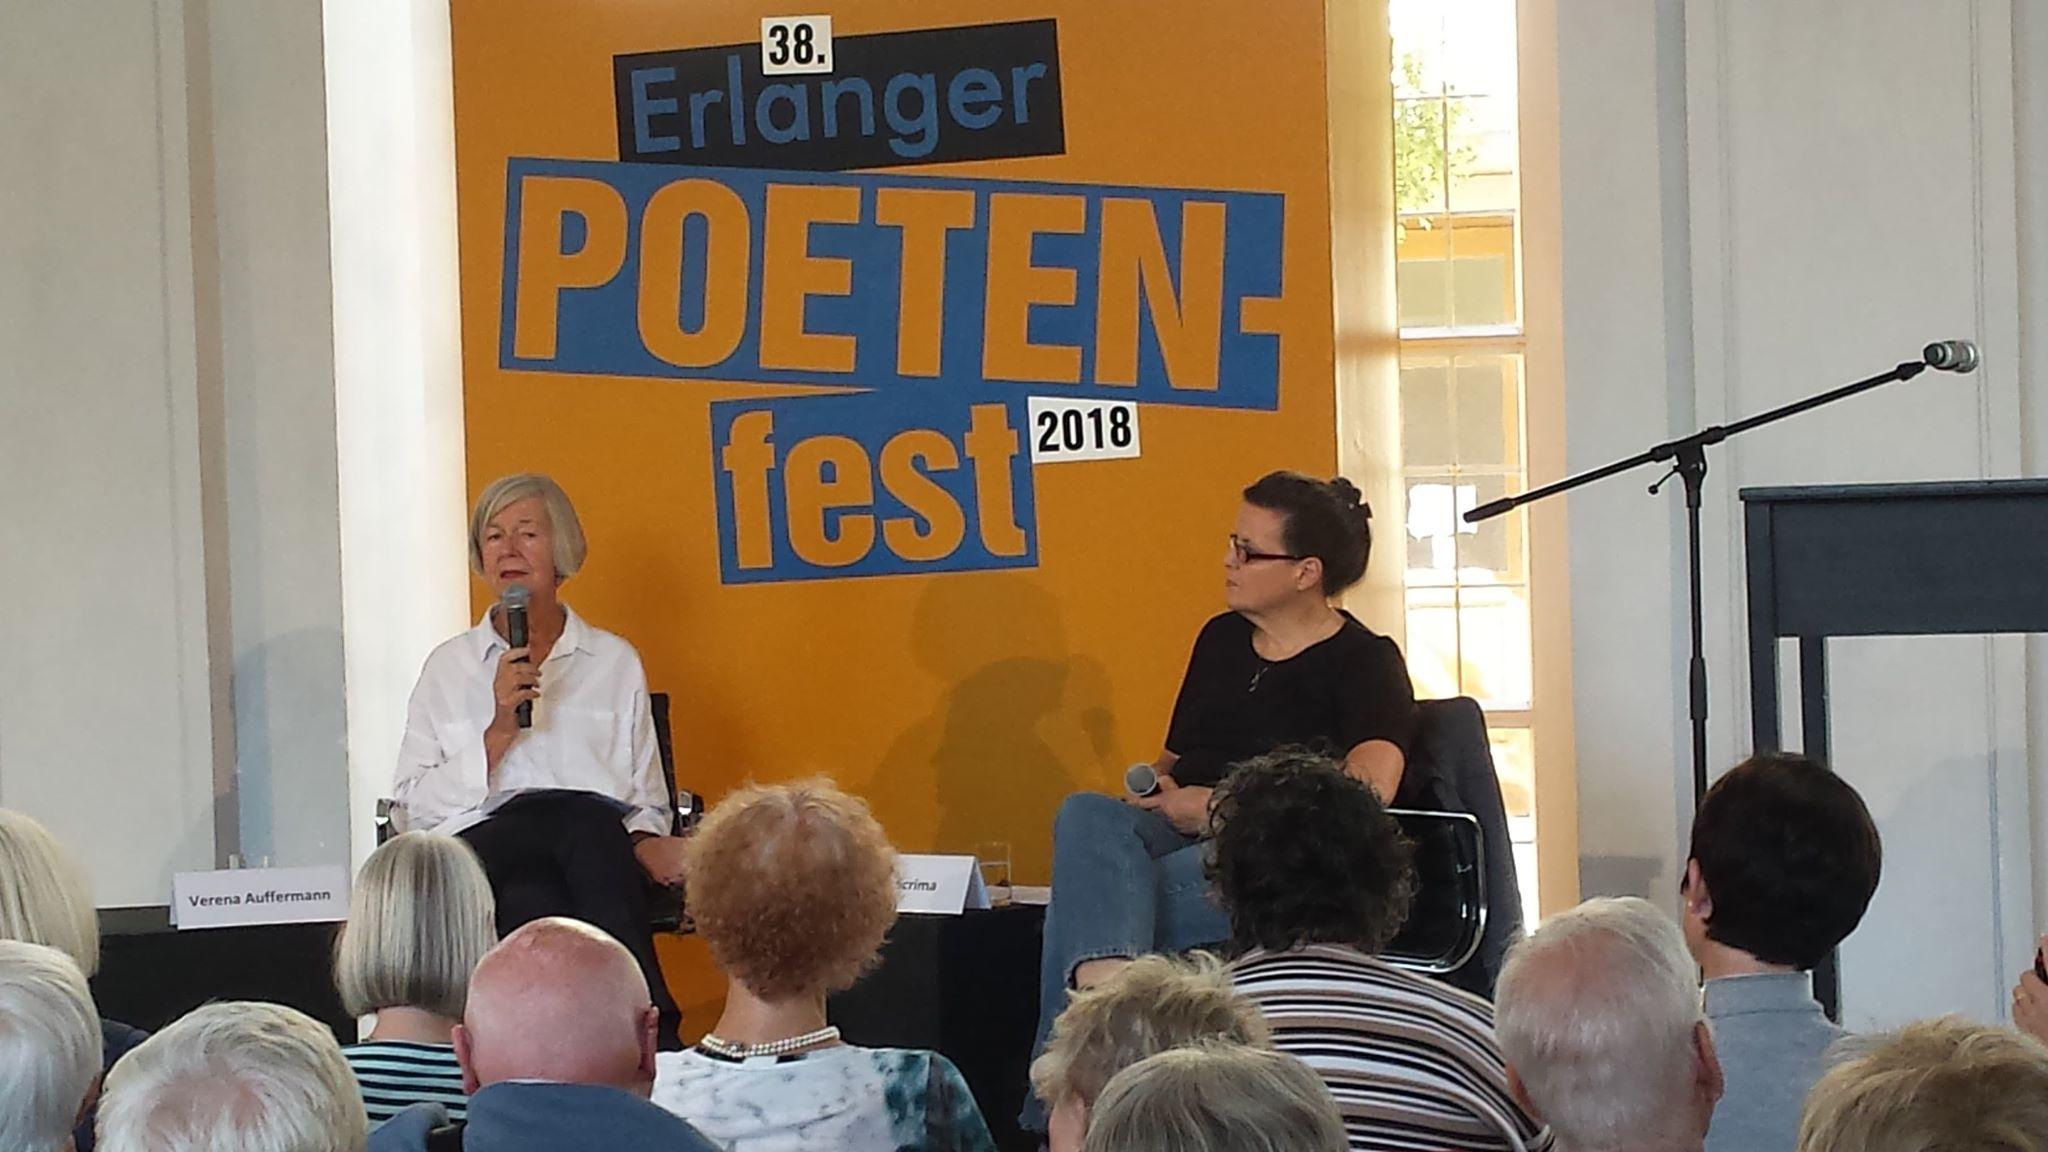 Erlanger Poetenfest